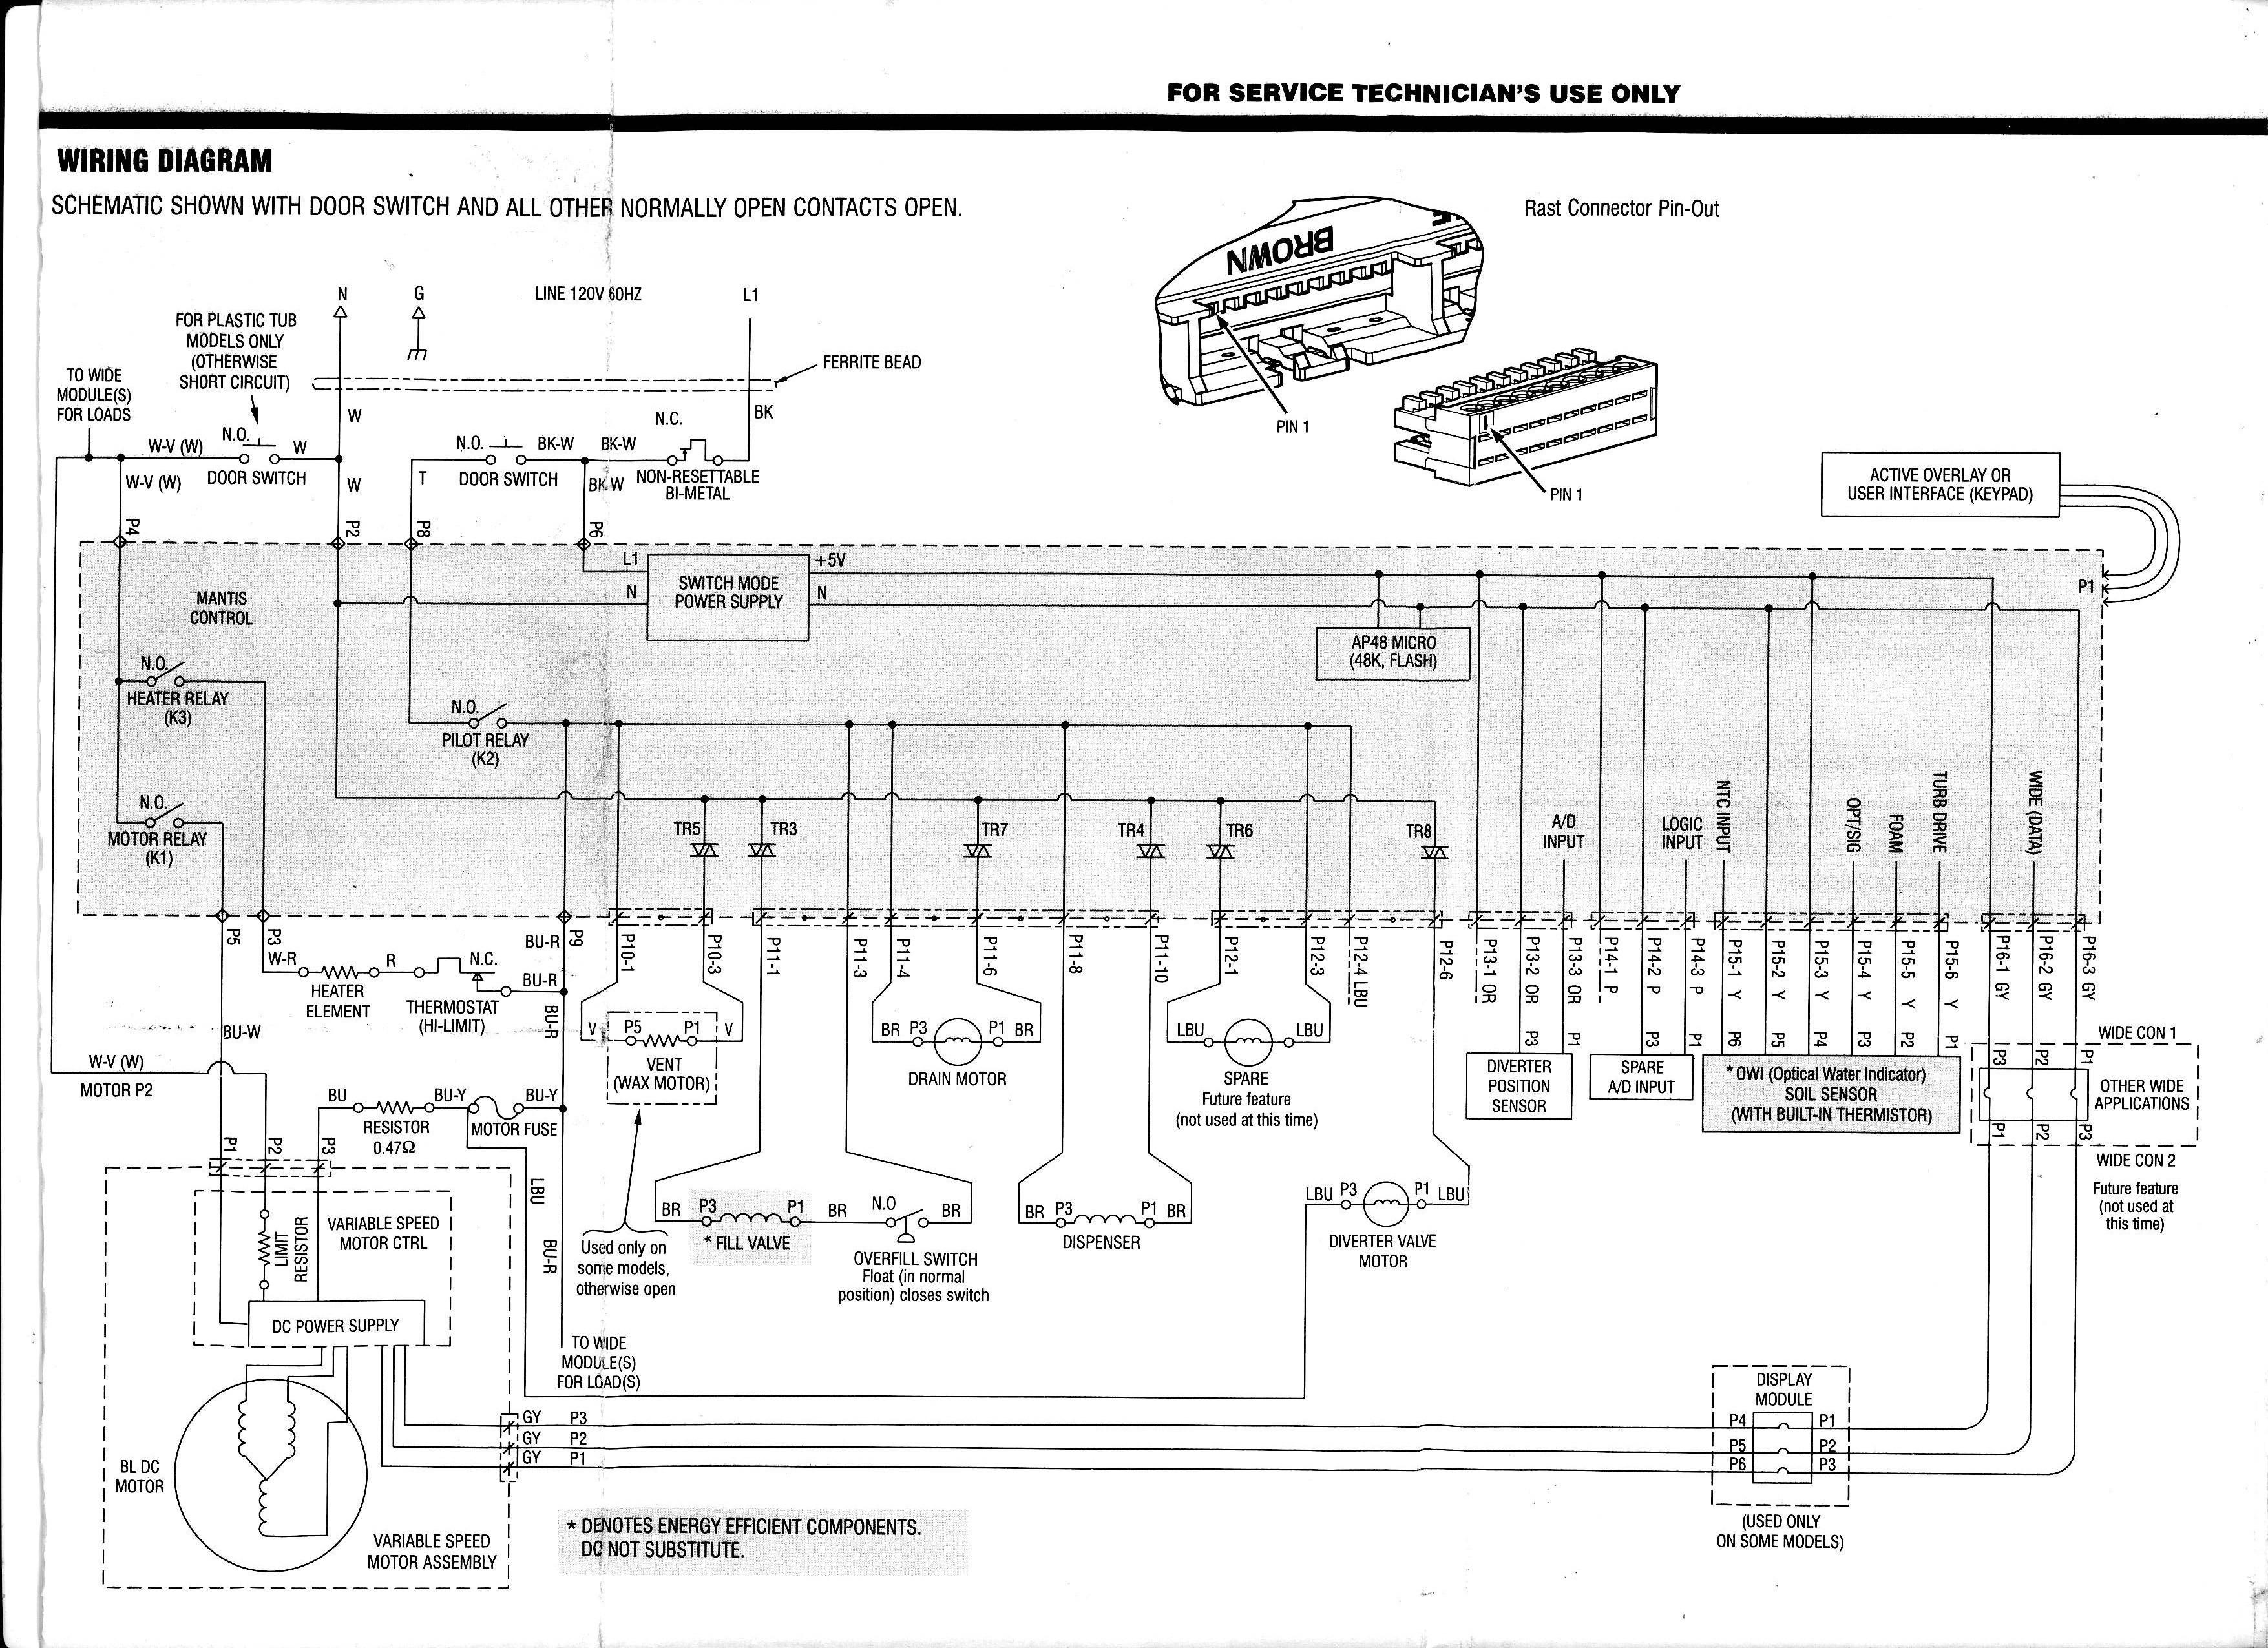 bosch dishwasher wiring diagram 2 amazing dishwasher wiring diagram rh detoxicrecenze com bosch exxcel dishwasher wiring diagram bosch dishwasher motor wiring diagram